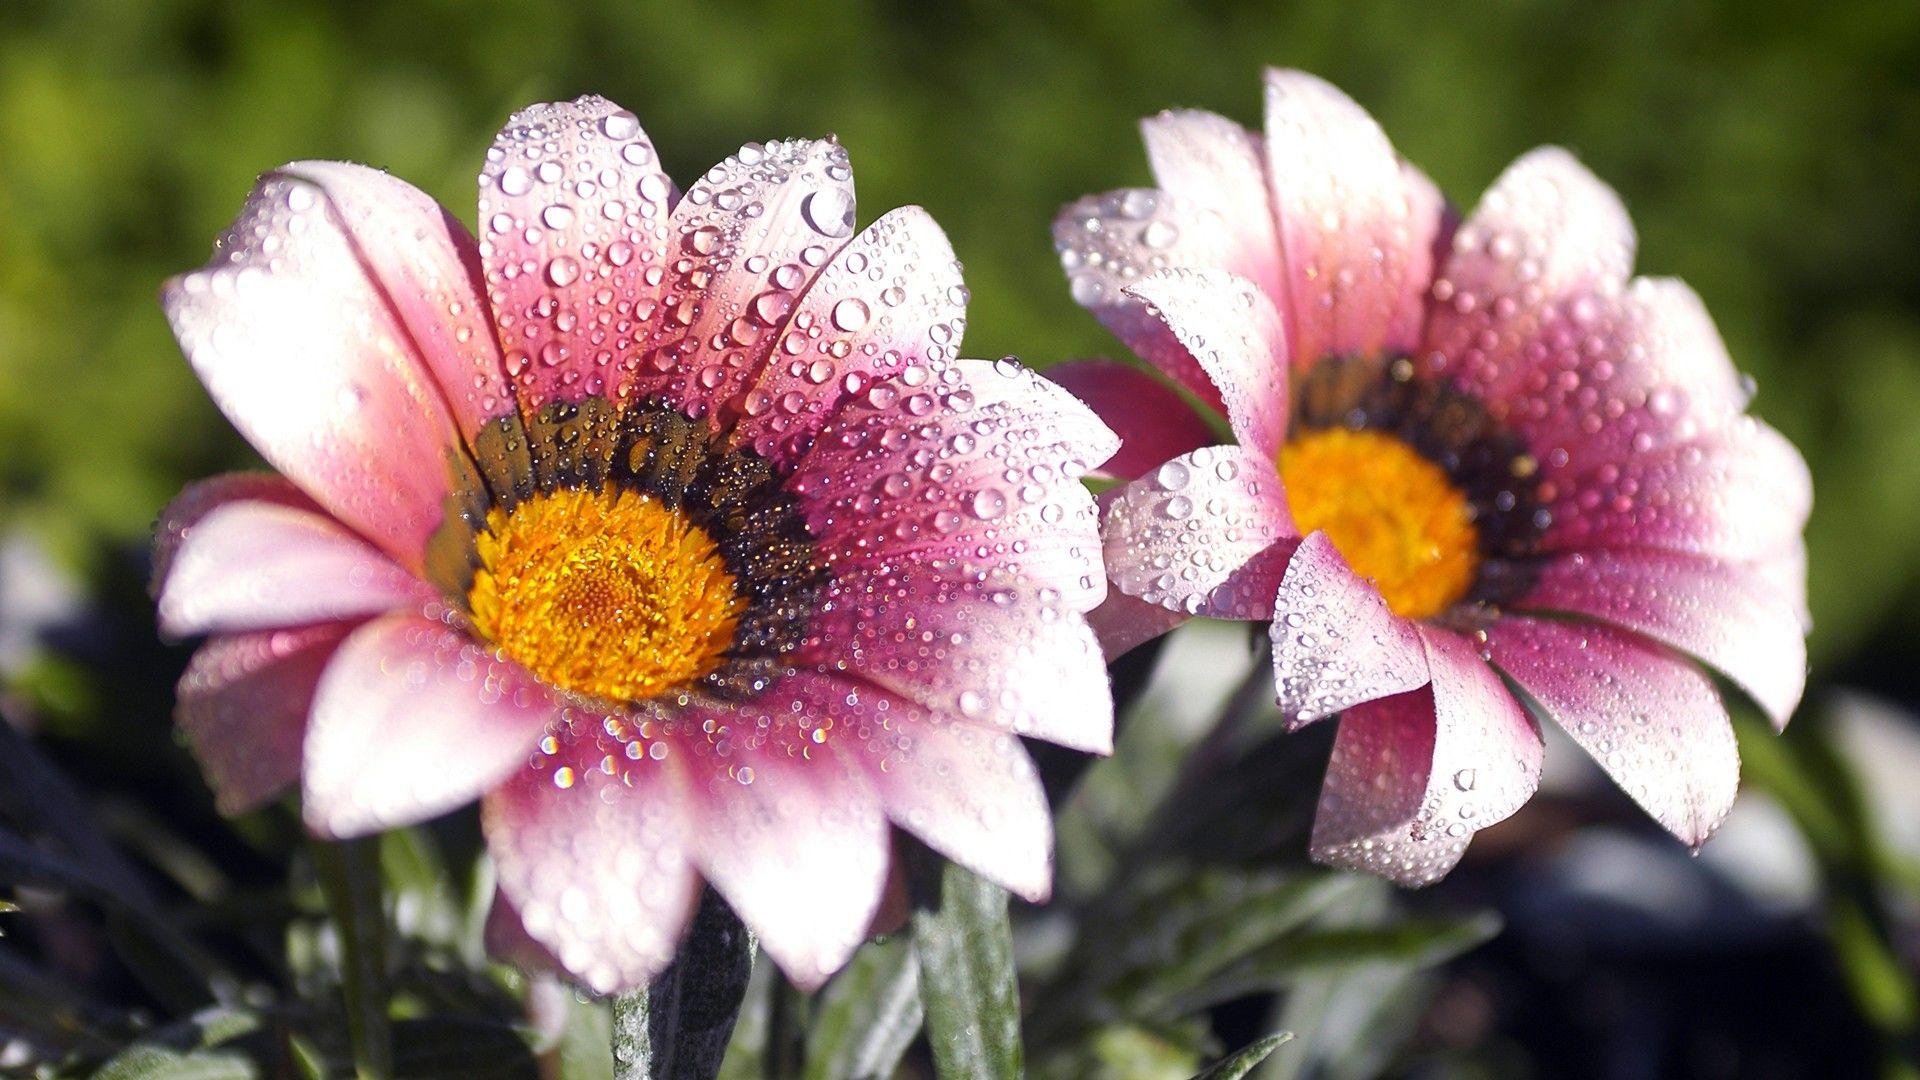 Imgur Com Amazing Flowers Photos Beautiful Flowers Hd Wallpapers Hd Flowers Amazing cool hd flower wallpapers